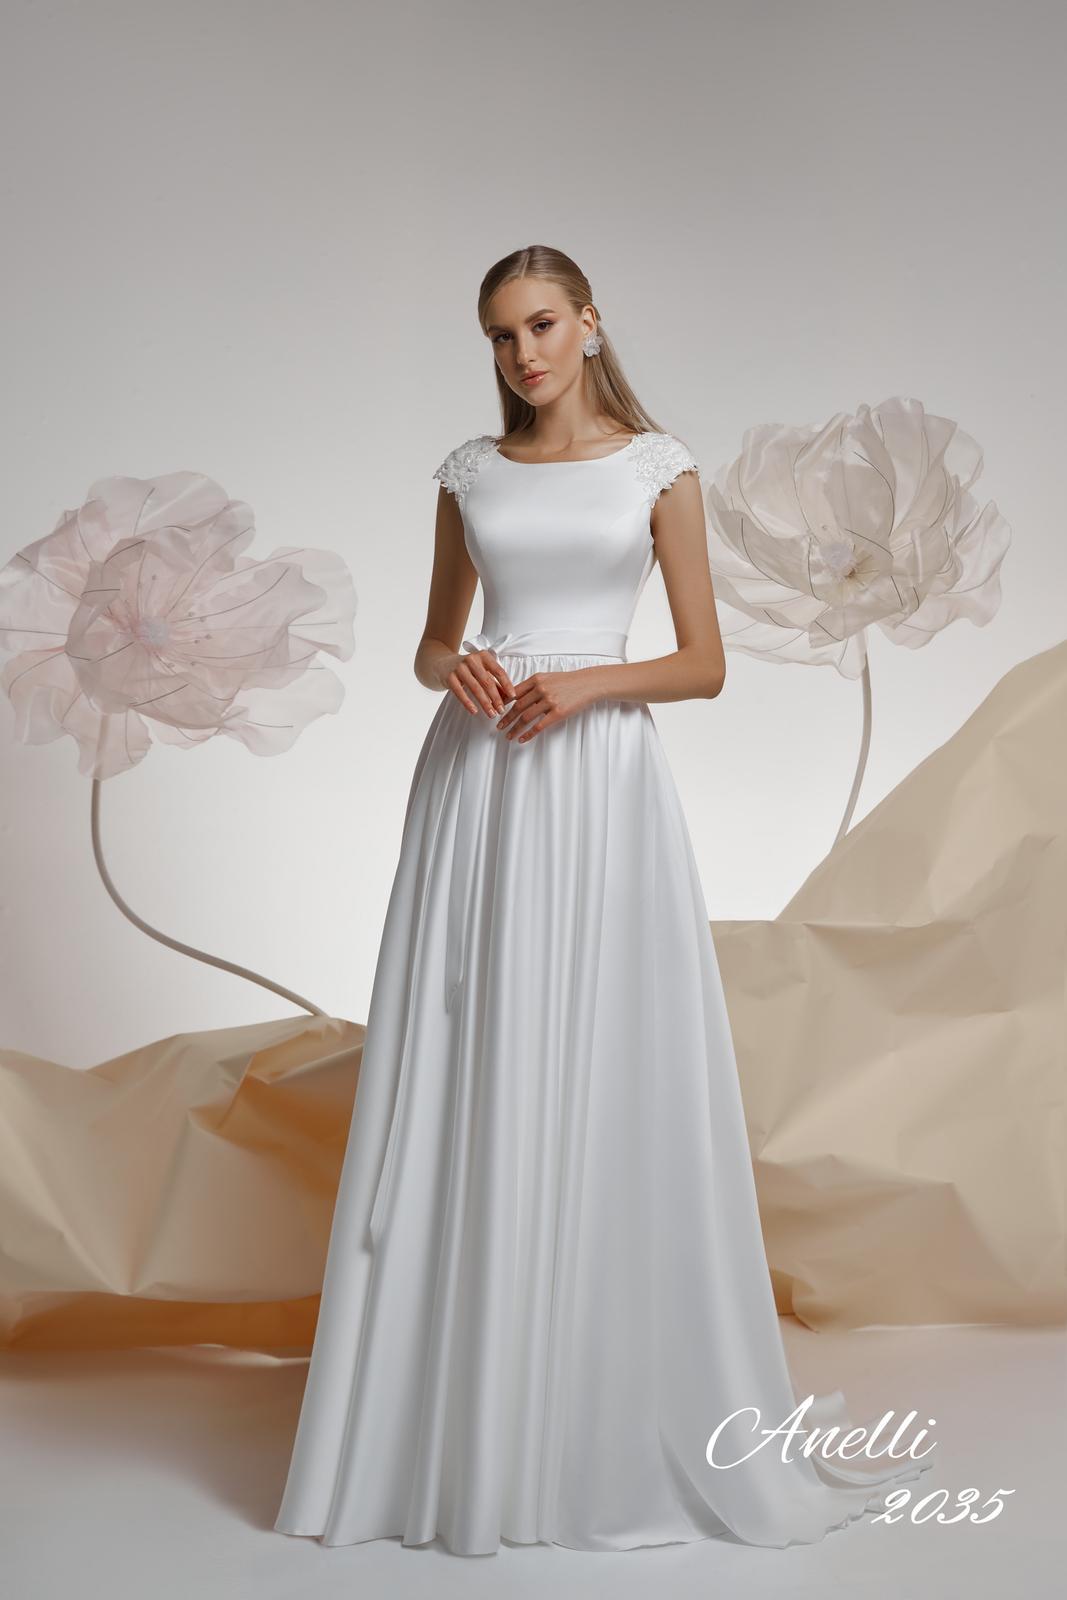 Svadobné šaty - Imagine 2035 - Obrázok č. 1